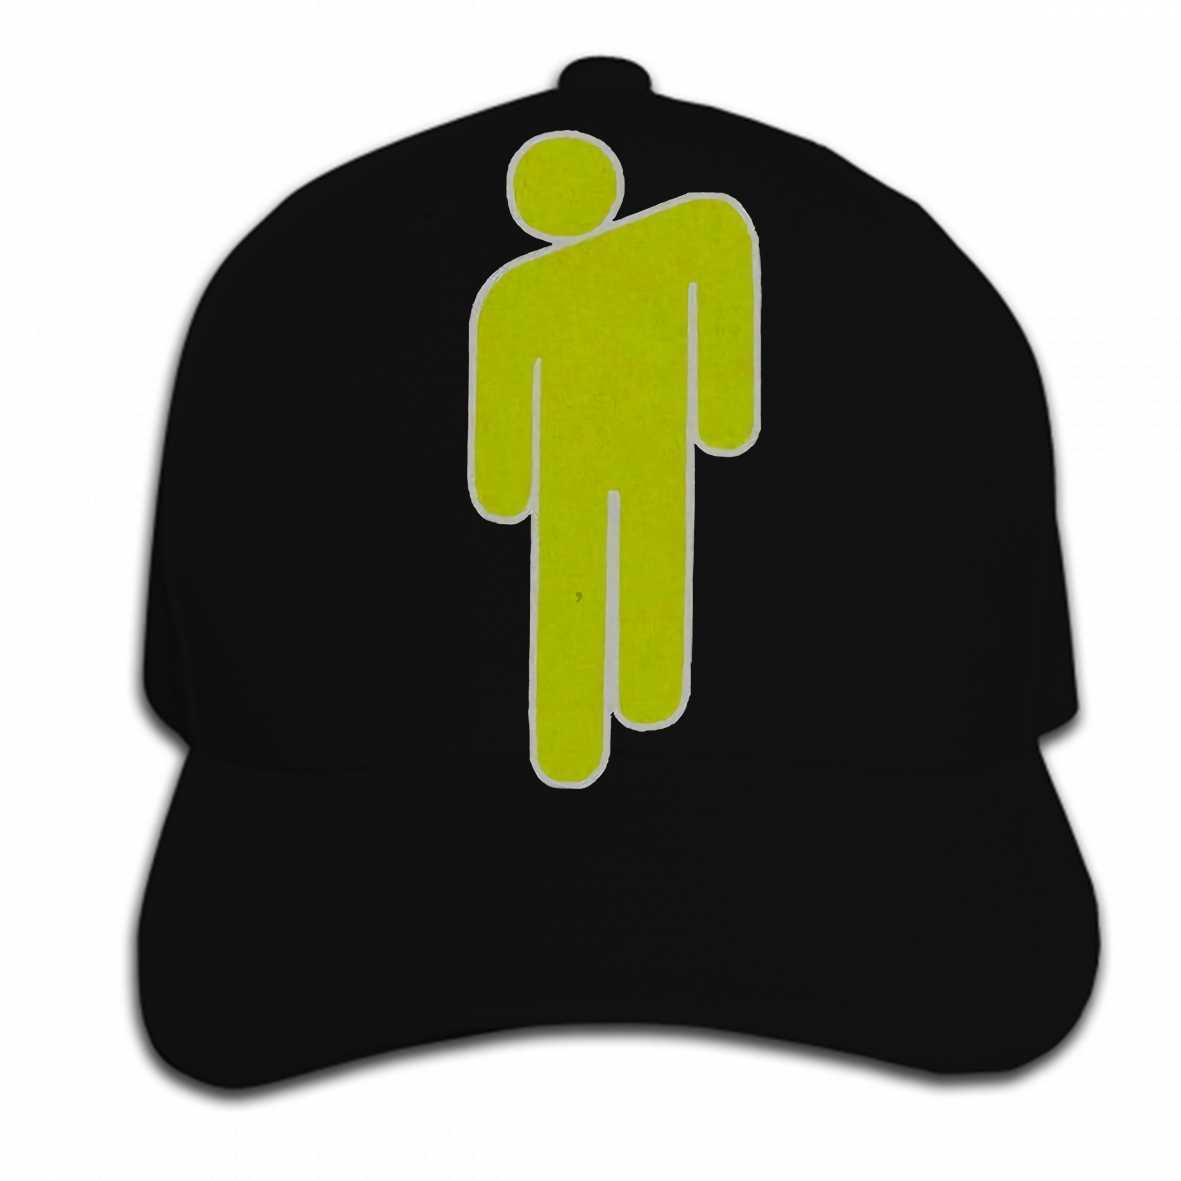 27b5b78b1081d Detail Feedback Questions about Print Custom Baseball Cap New Billie Eilish  1 By 1 Tour RARE 2019 2019 Hat Peaked cap on Aliexpress.com